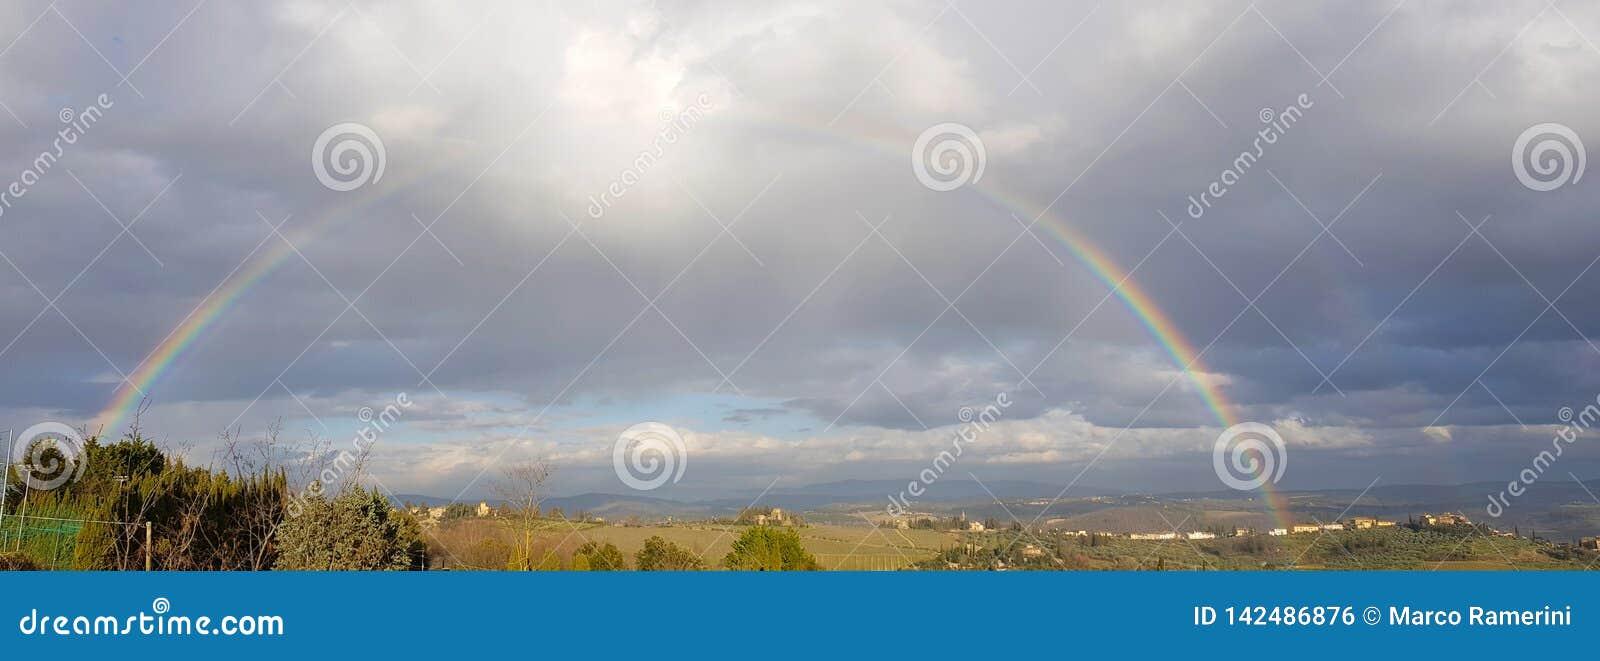 Arco iris completo espectacular sobre las colinas de Chianti, Toscana, Italia